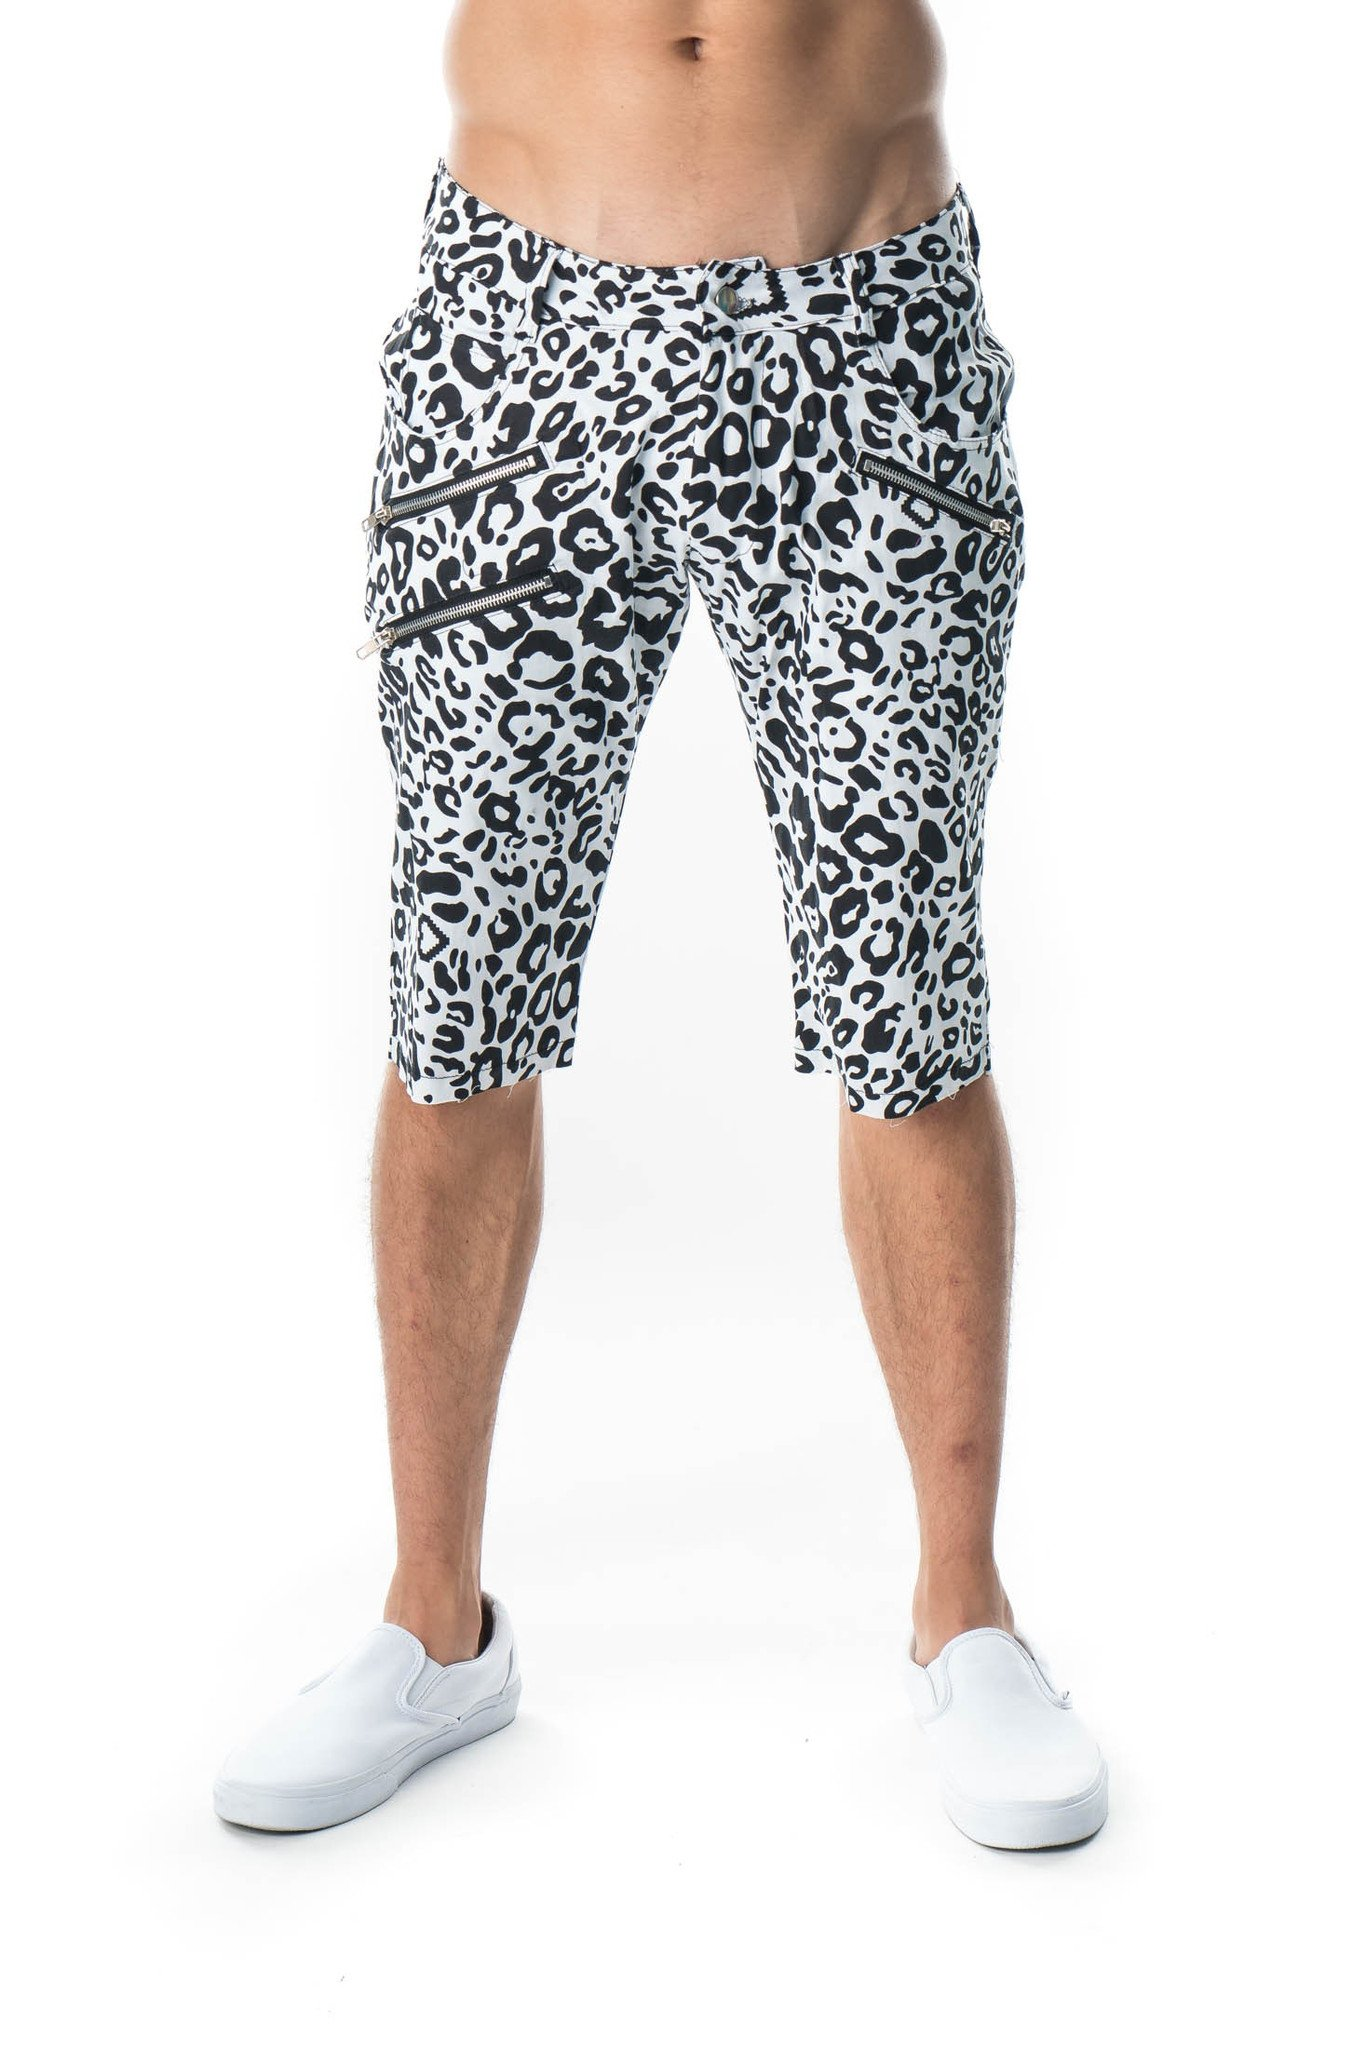 Party Rock Clothing★パーティーロッククロッシング ★La Freak Cheetah Huck Finns(ホワイト)